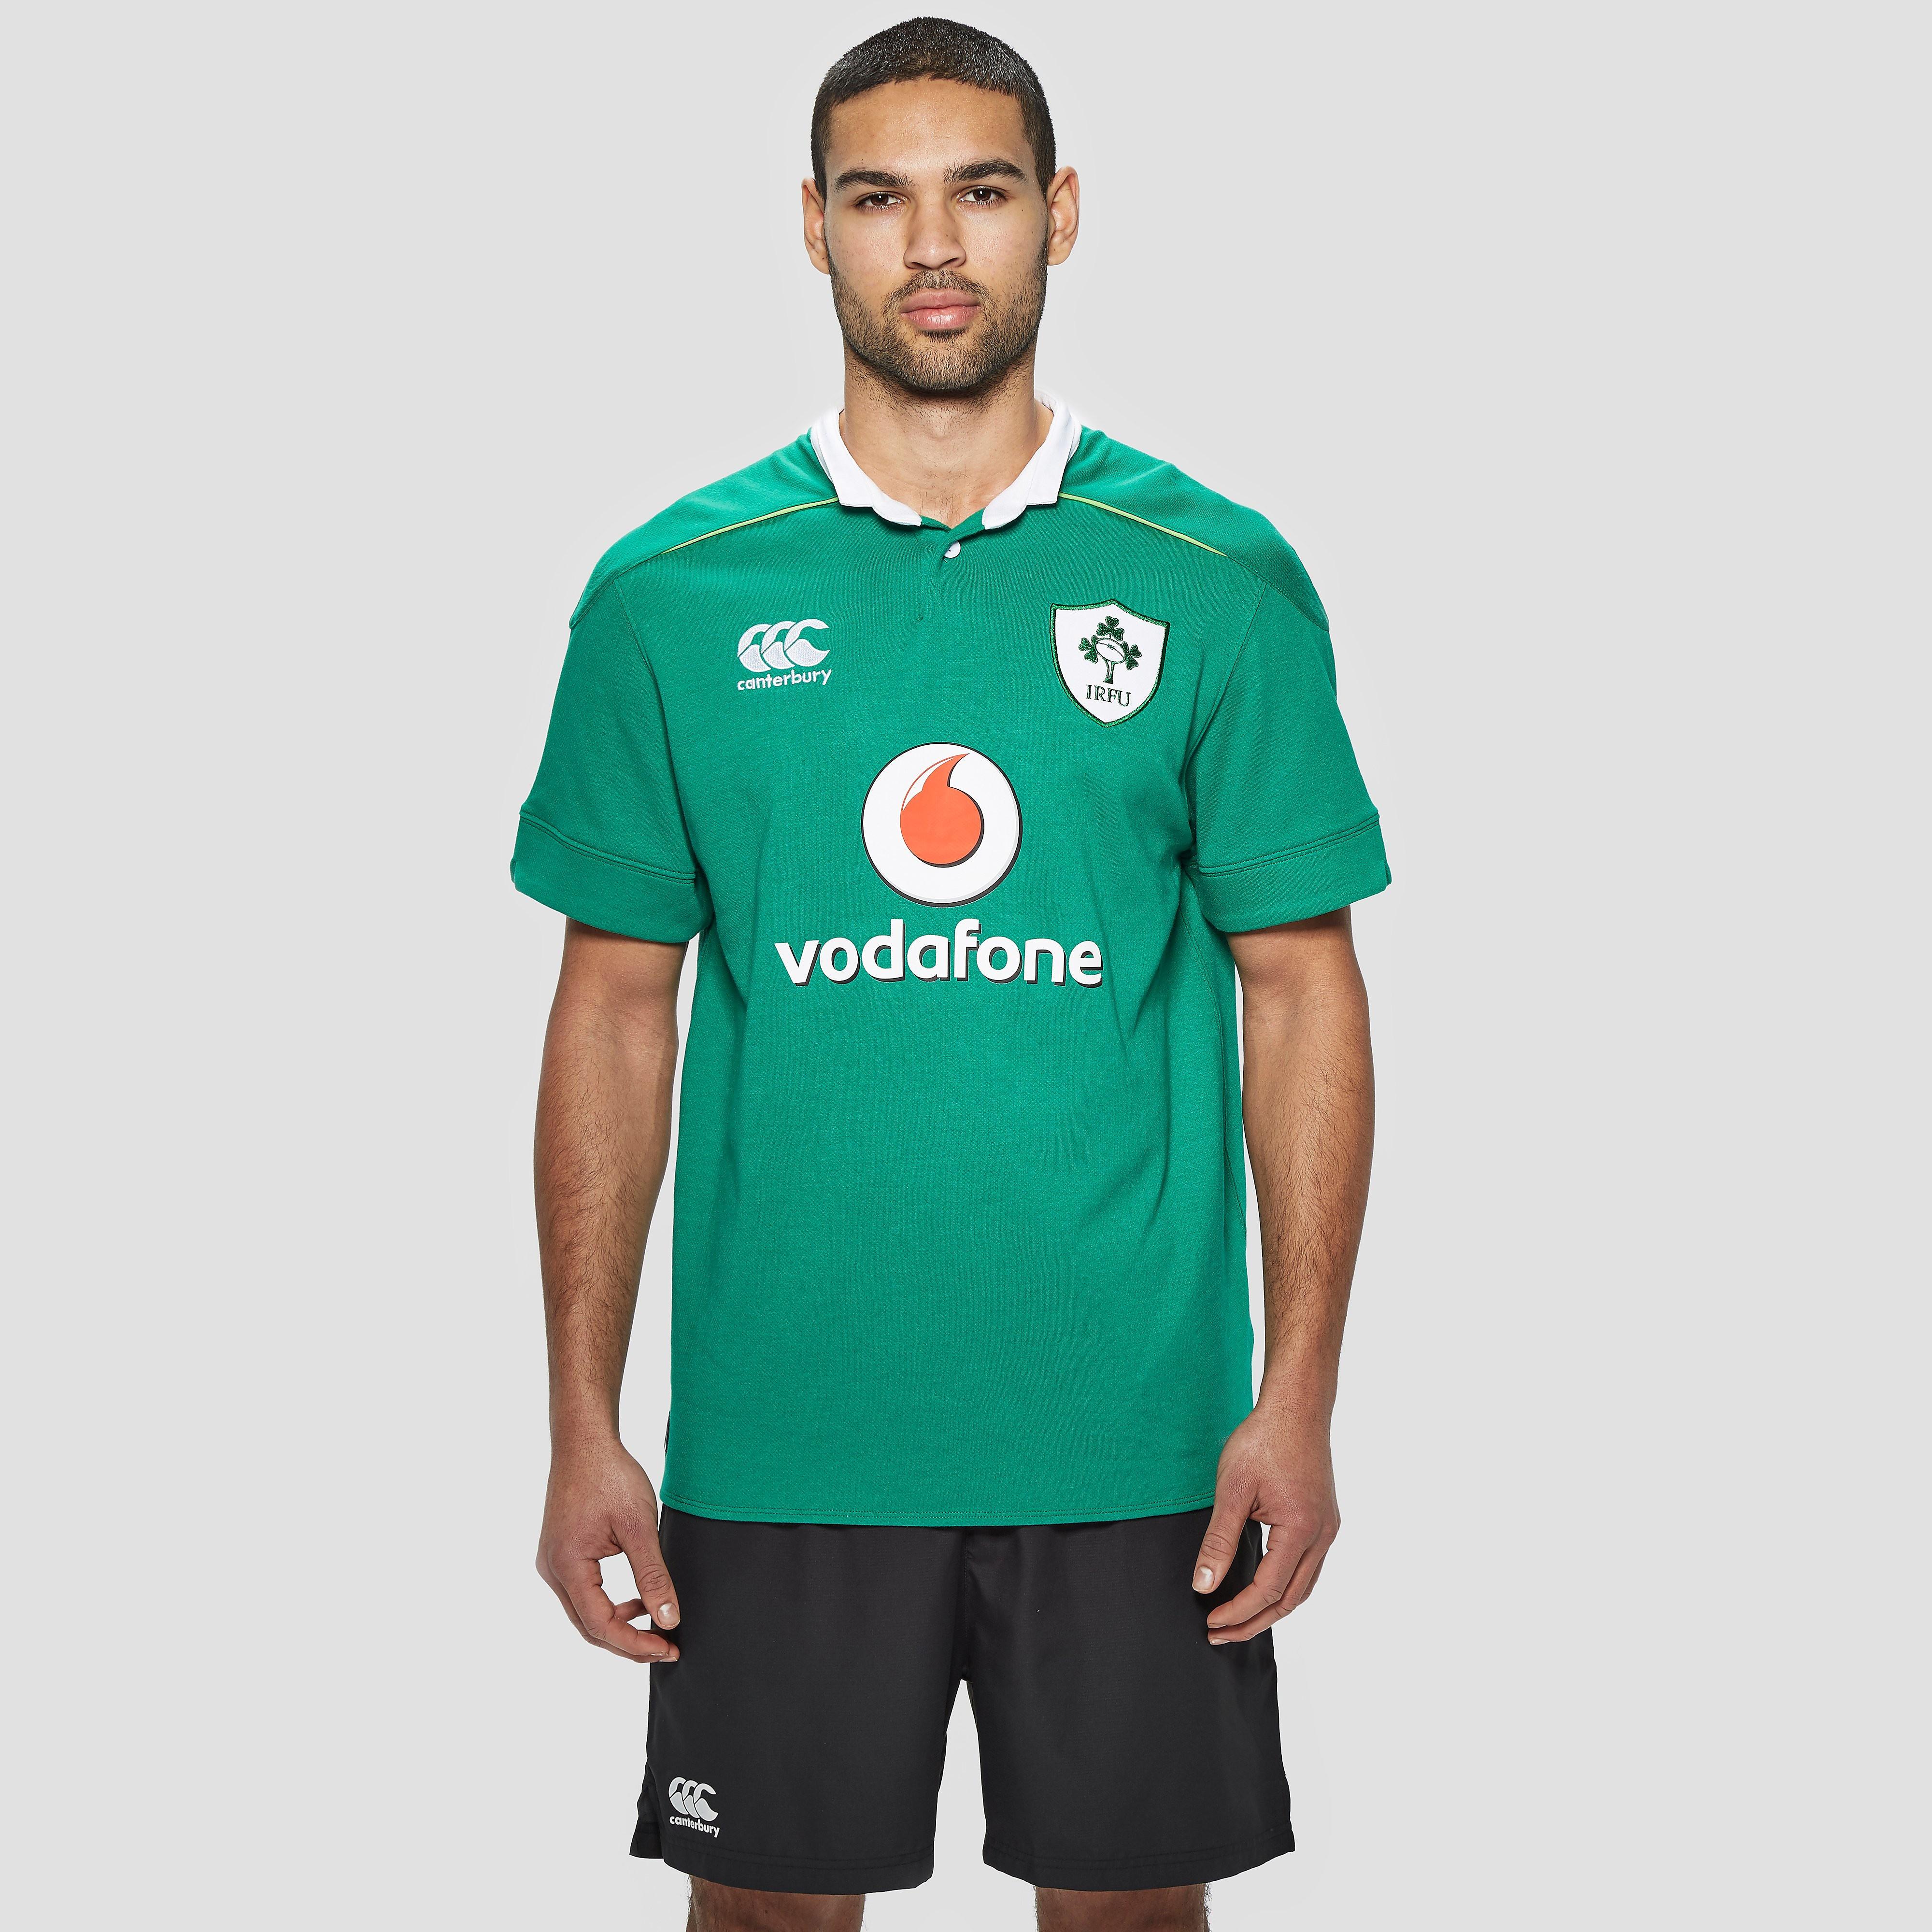 Canterbury Ireland RFU 2016 Home Classic Shirt